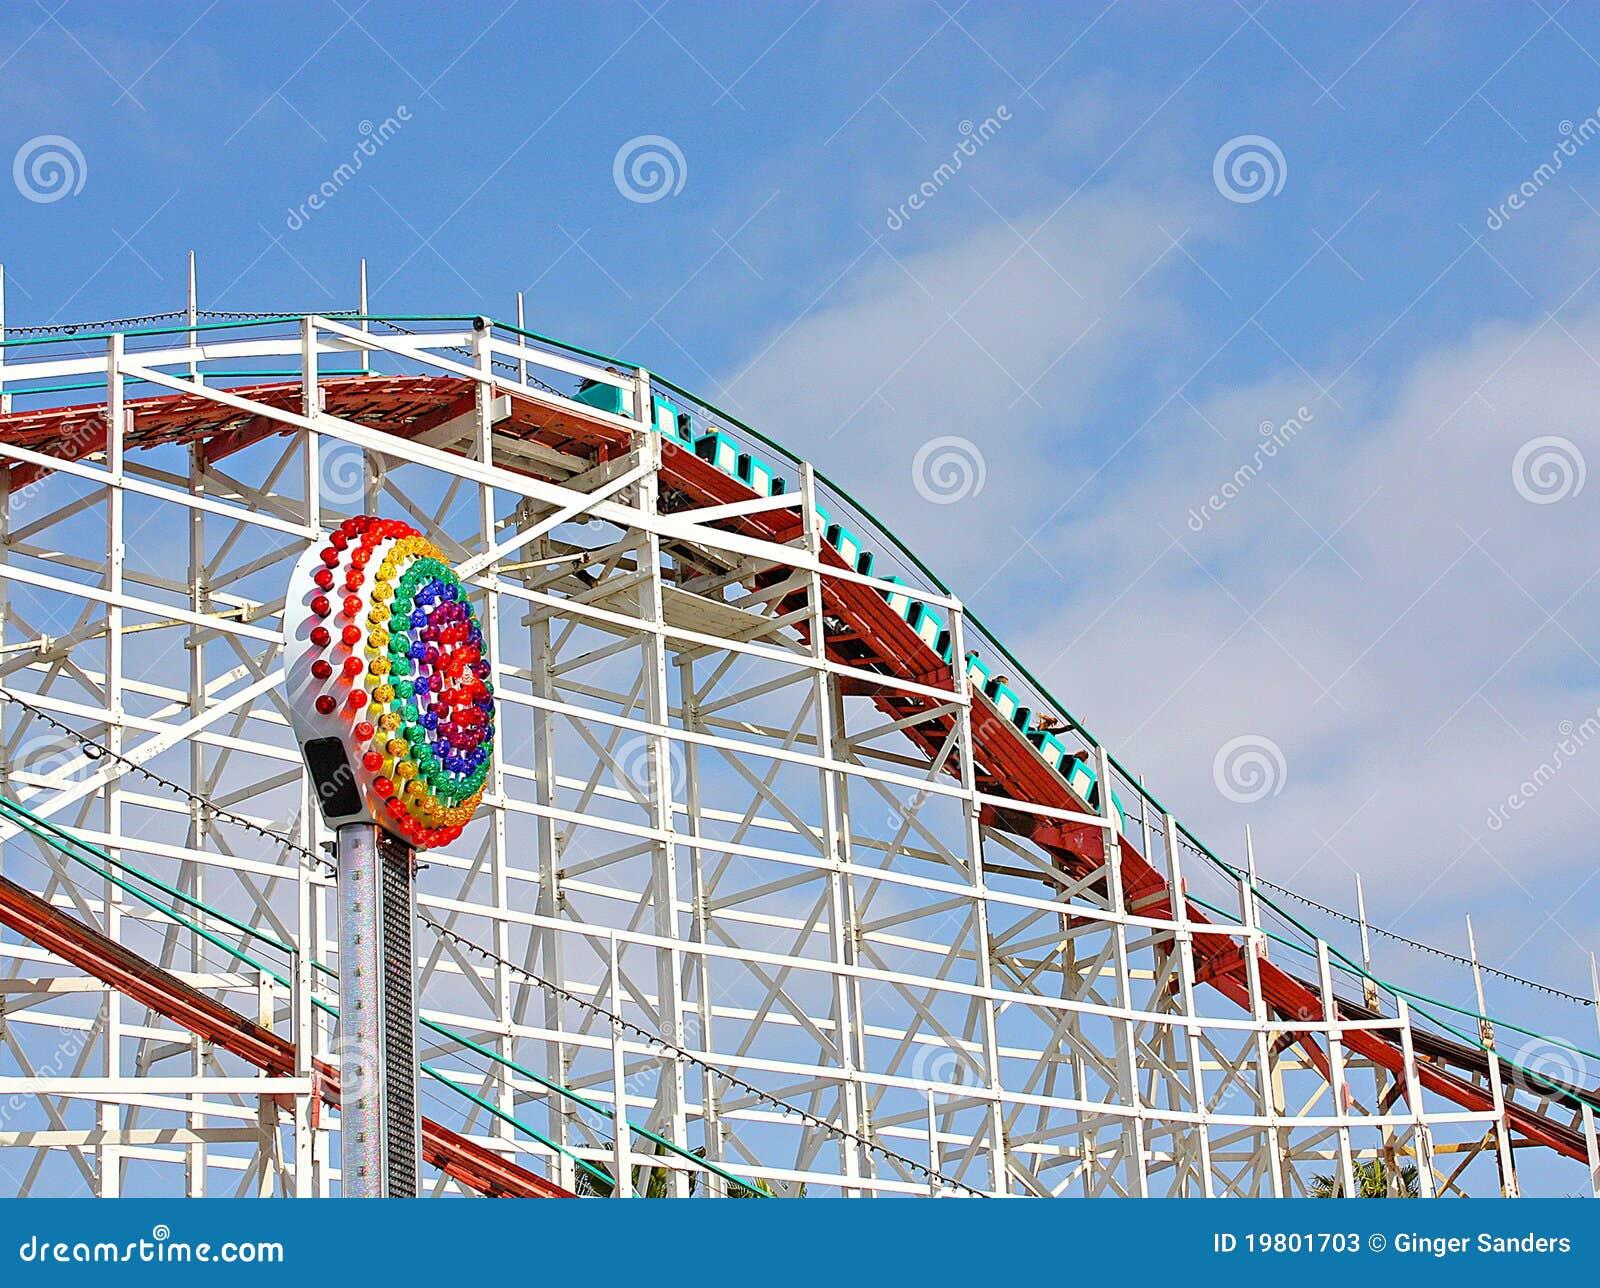 Roller Coaster Under Blue Skies